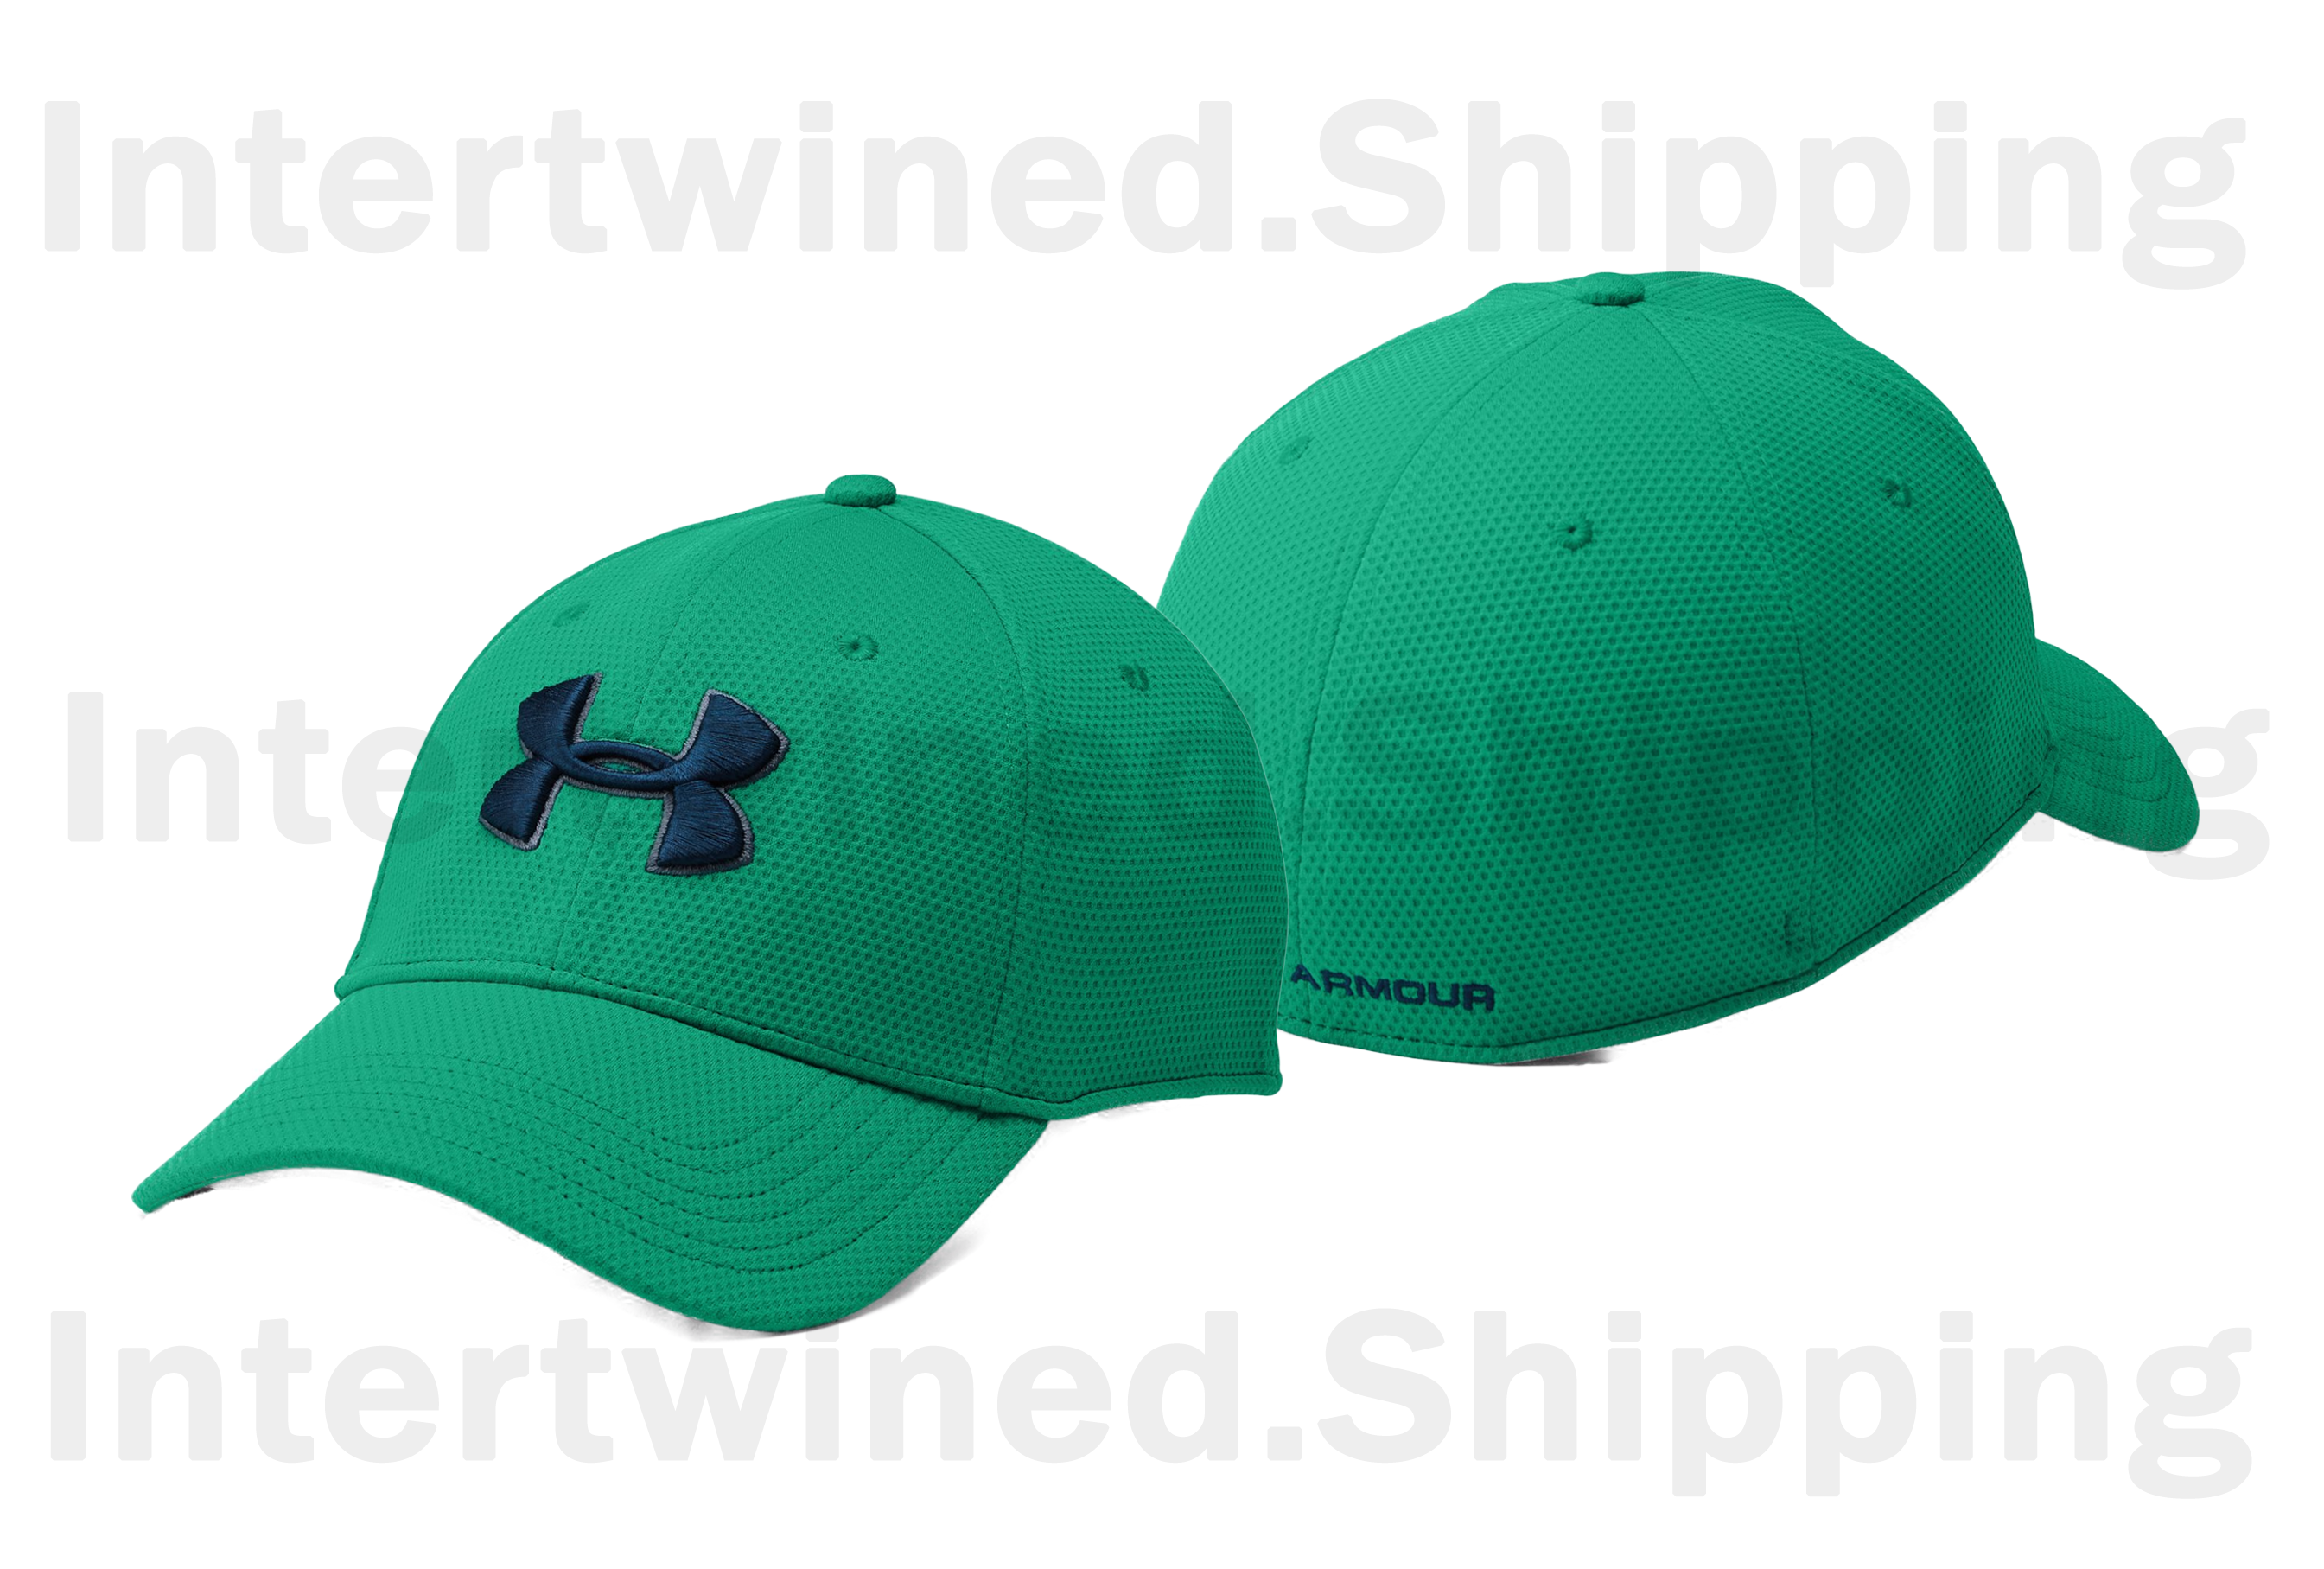 32c9455faa0 Under Armour 1254123 Men s Blitzing II Stretch Fit Cap HeatGear Fitted Hat